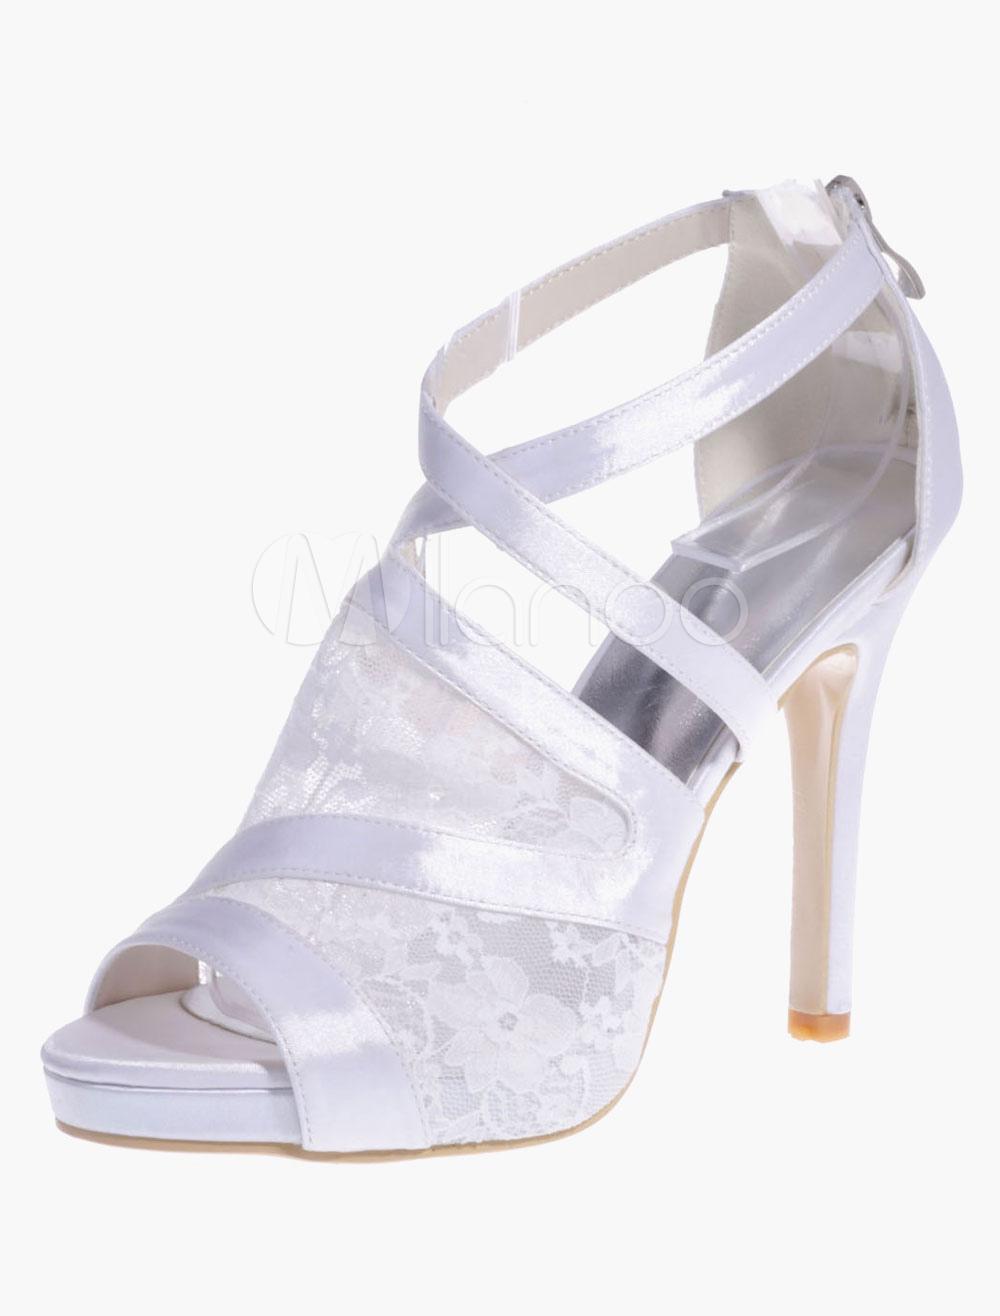 Elegant Round Toe Lace Platform Satin Evening & Bride's Sandals